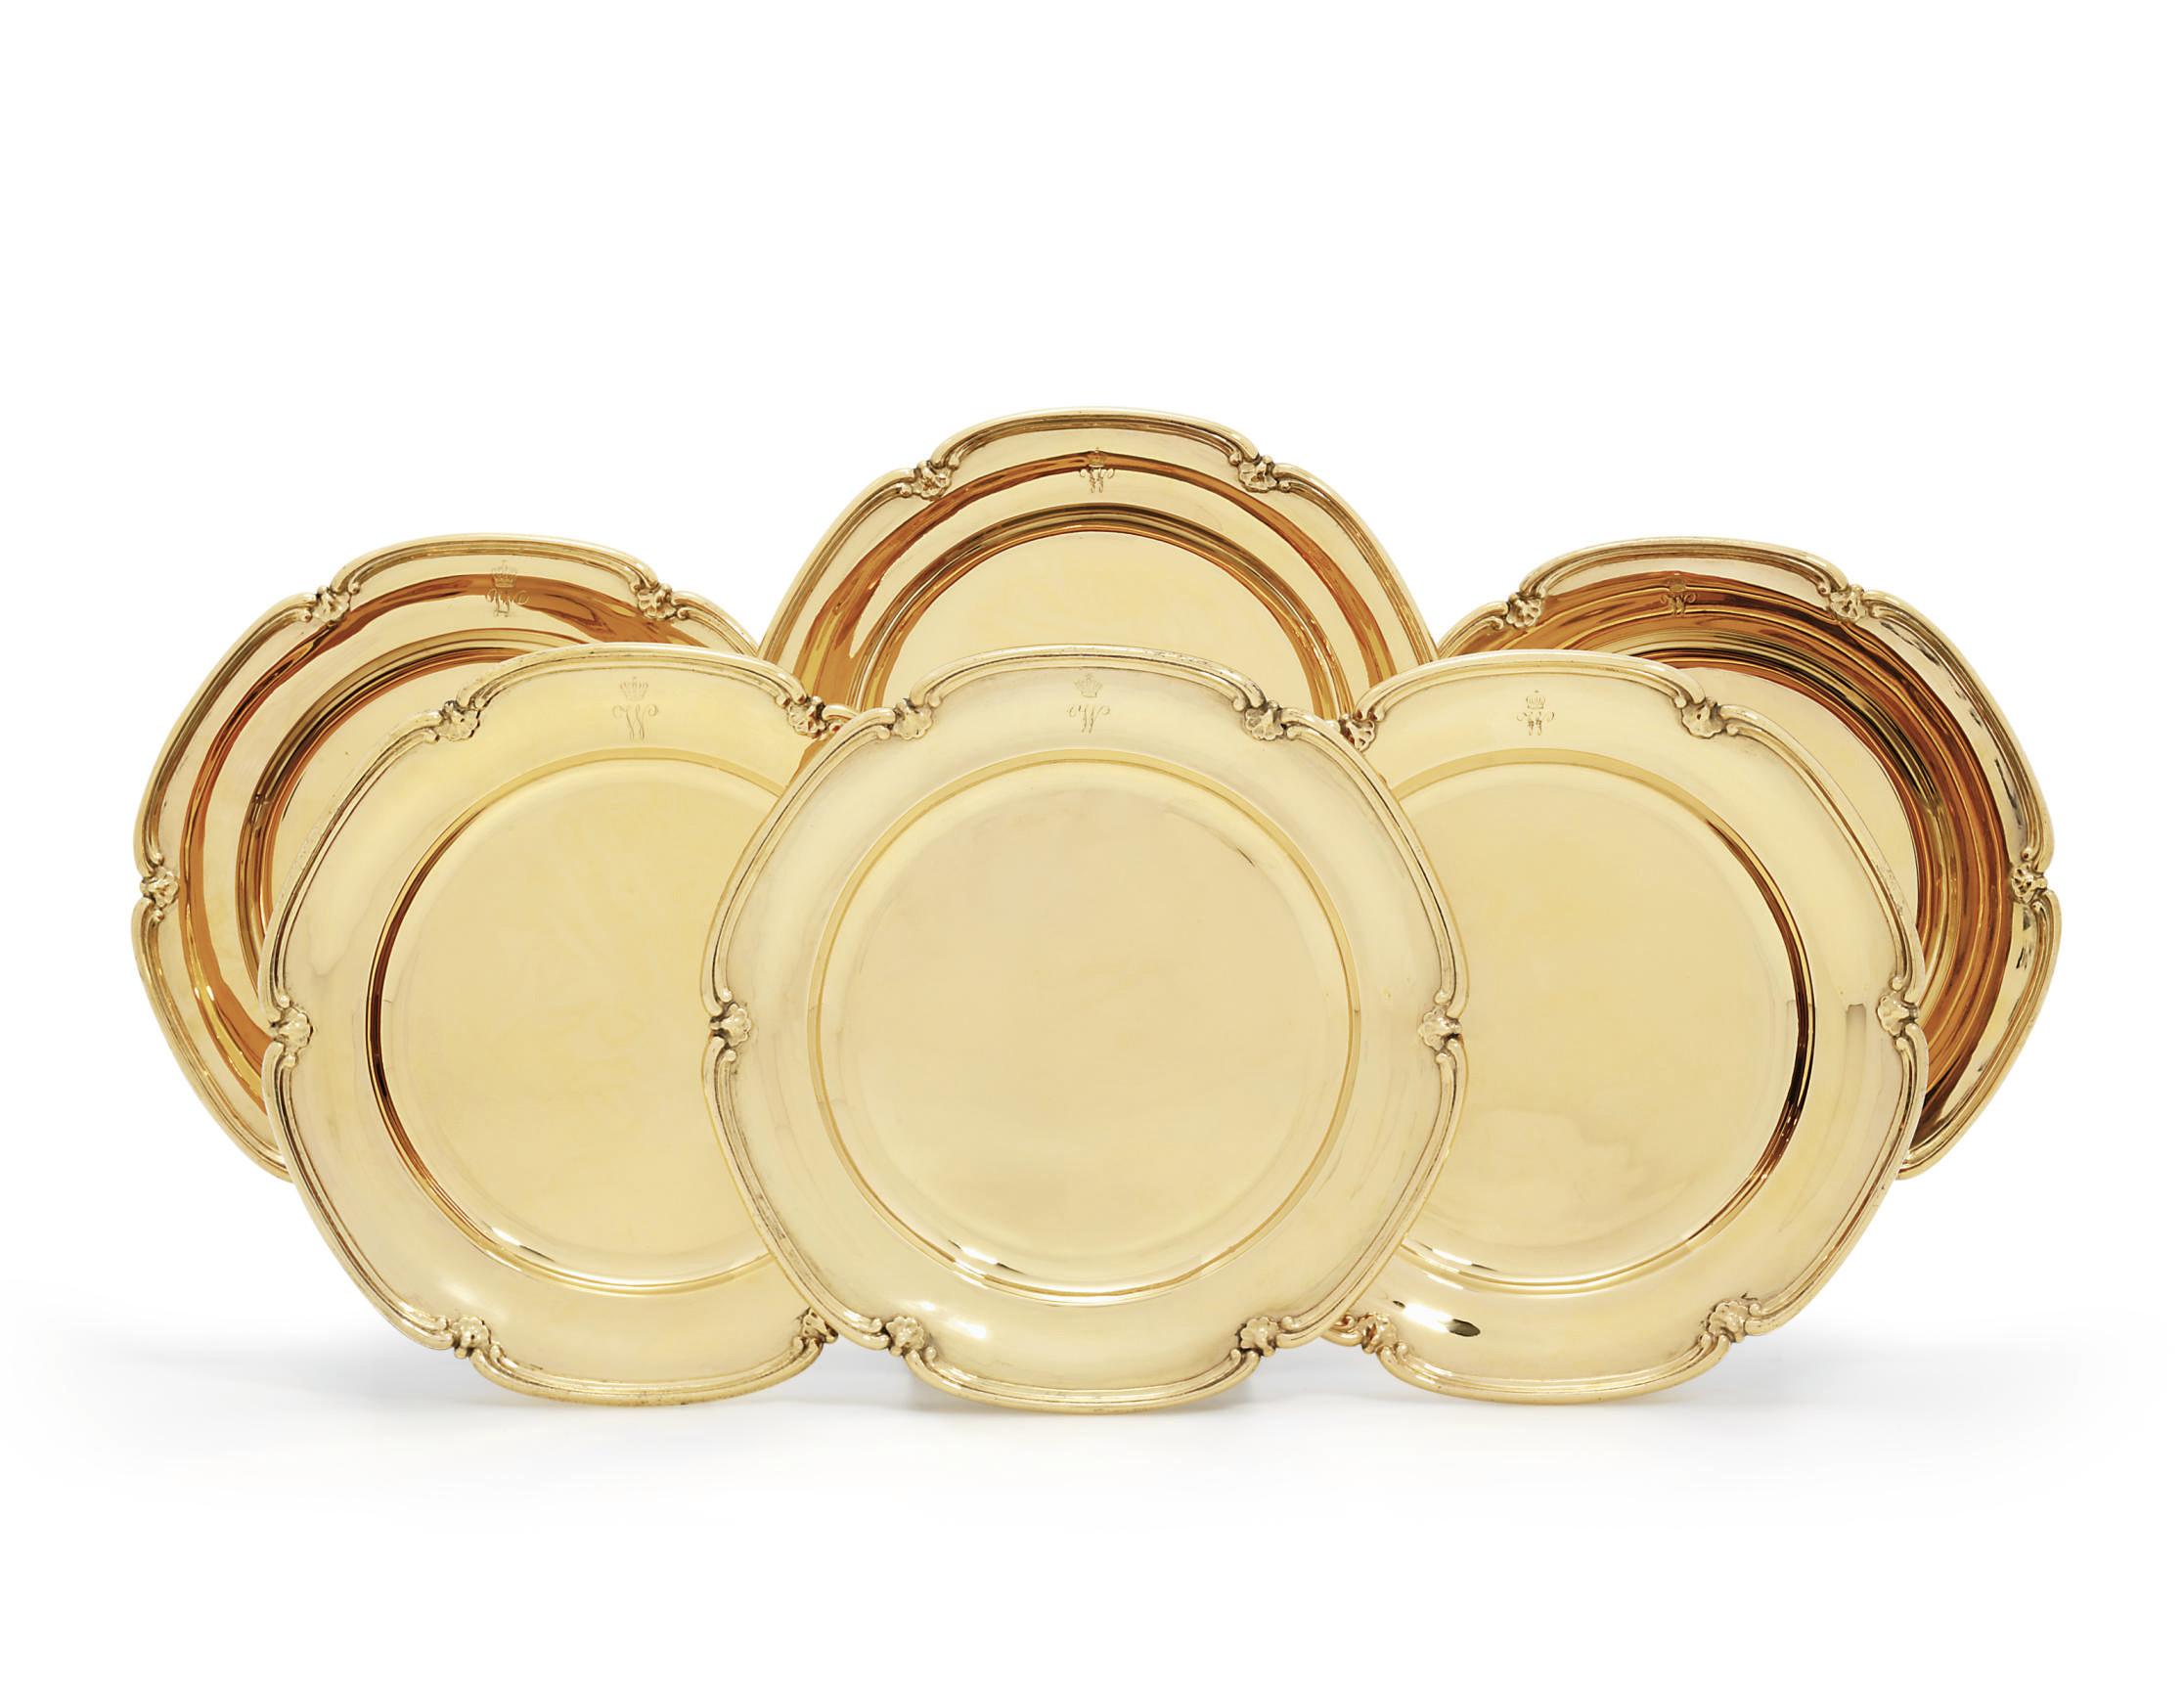 A SET OF SIX GERMAN SILVER-GILT DINNER-PLATES